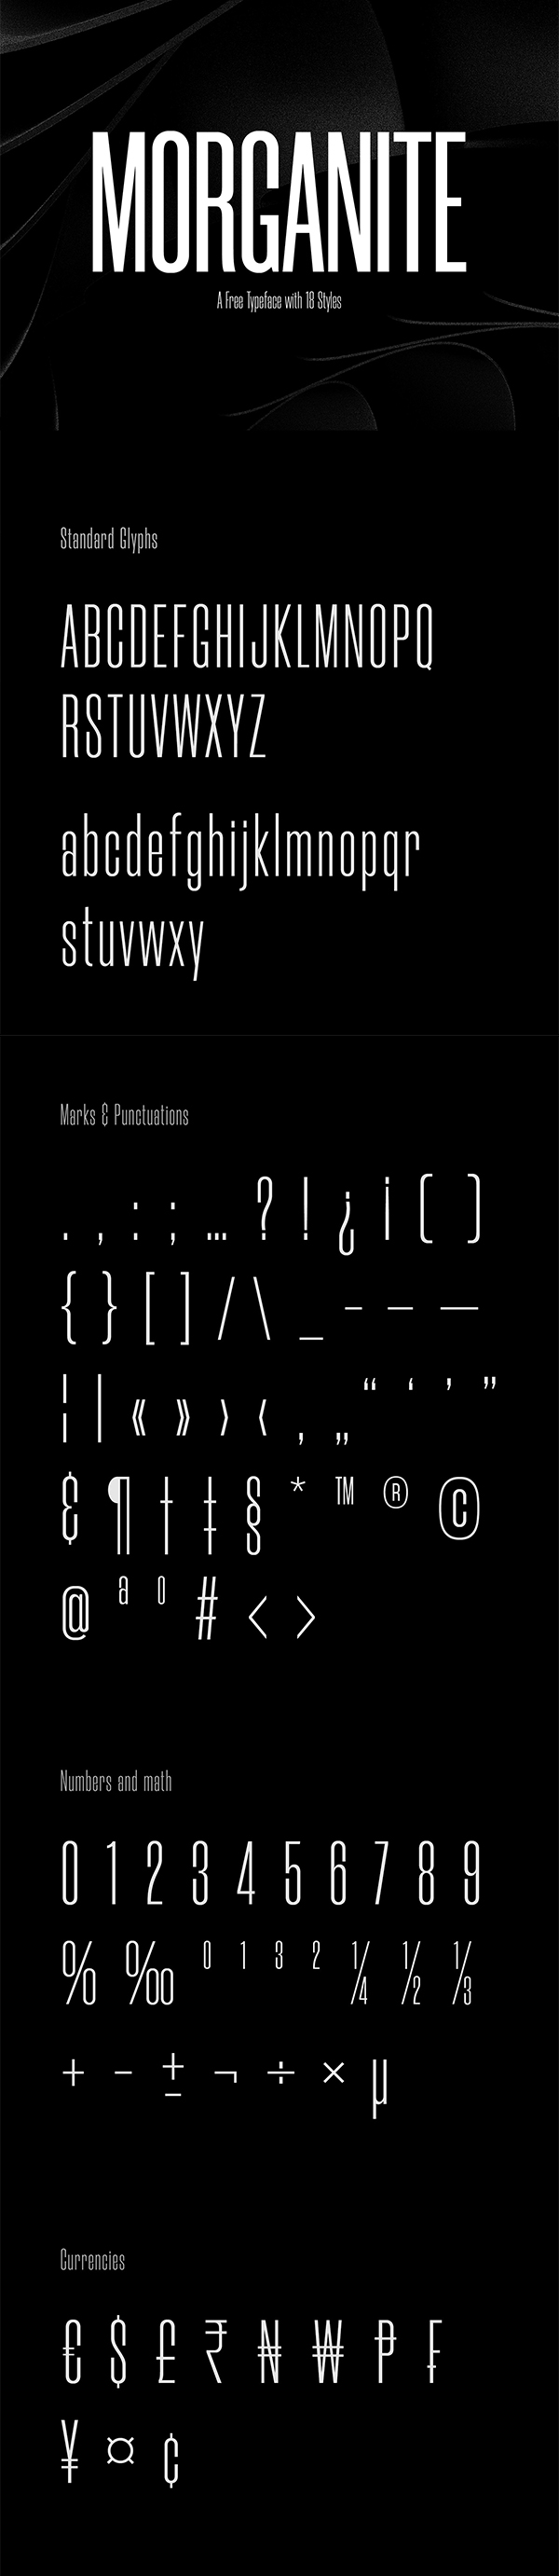 Morganite / Free Typeface